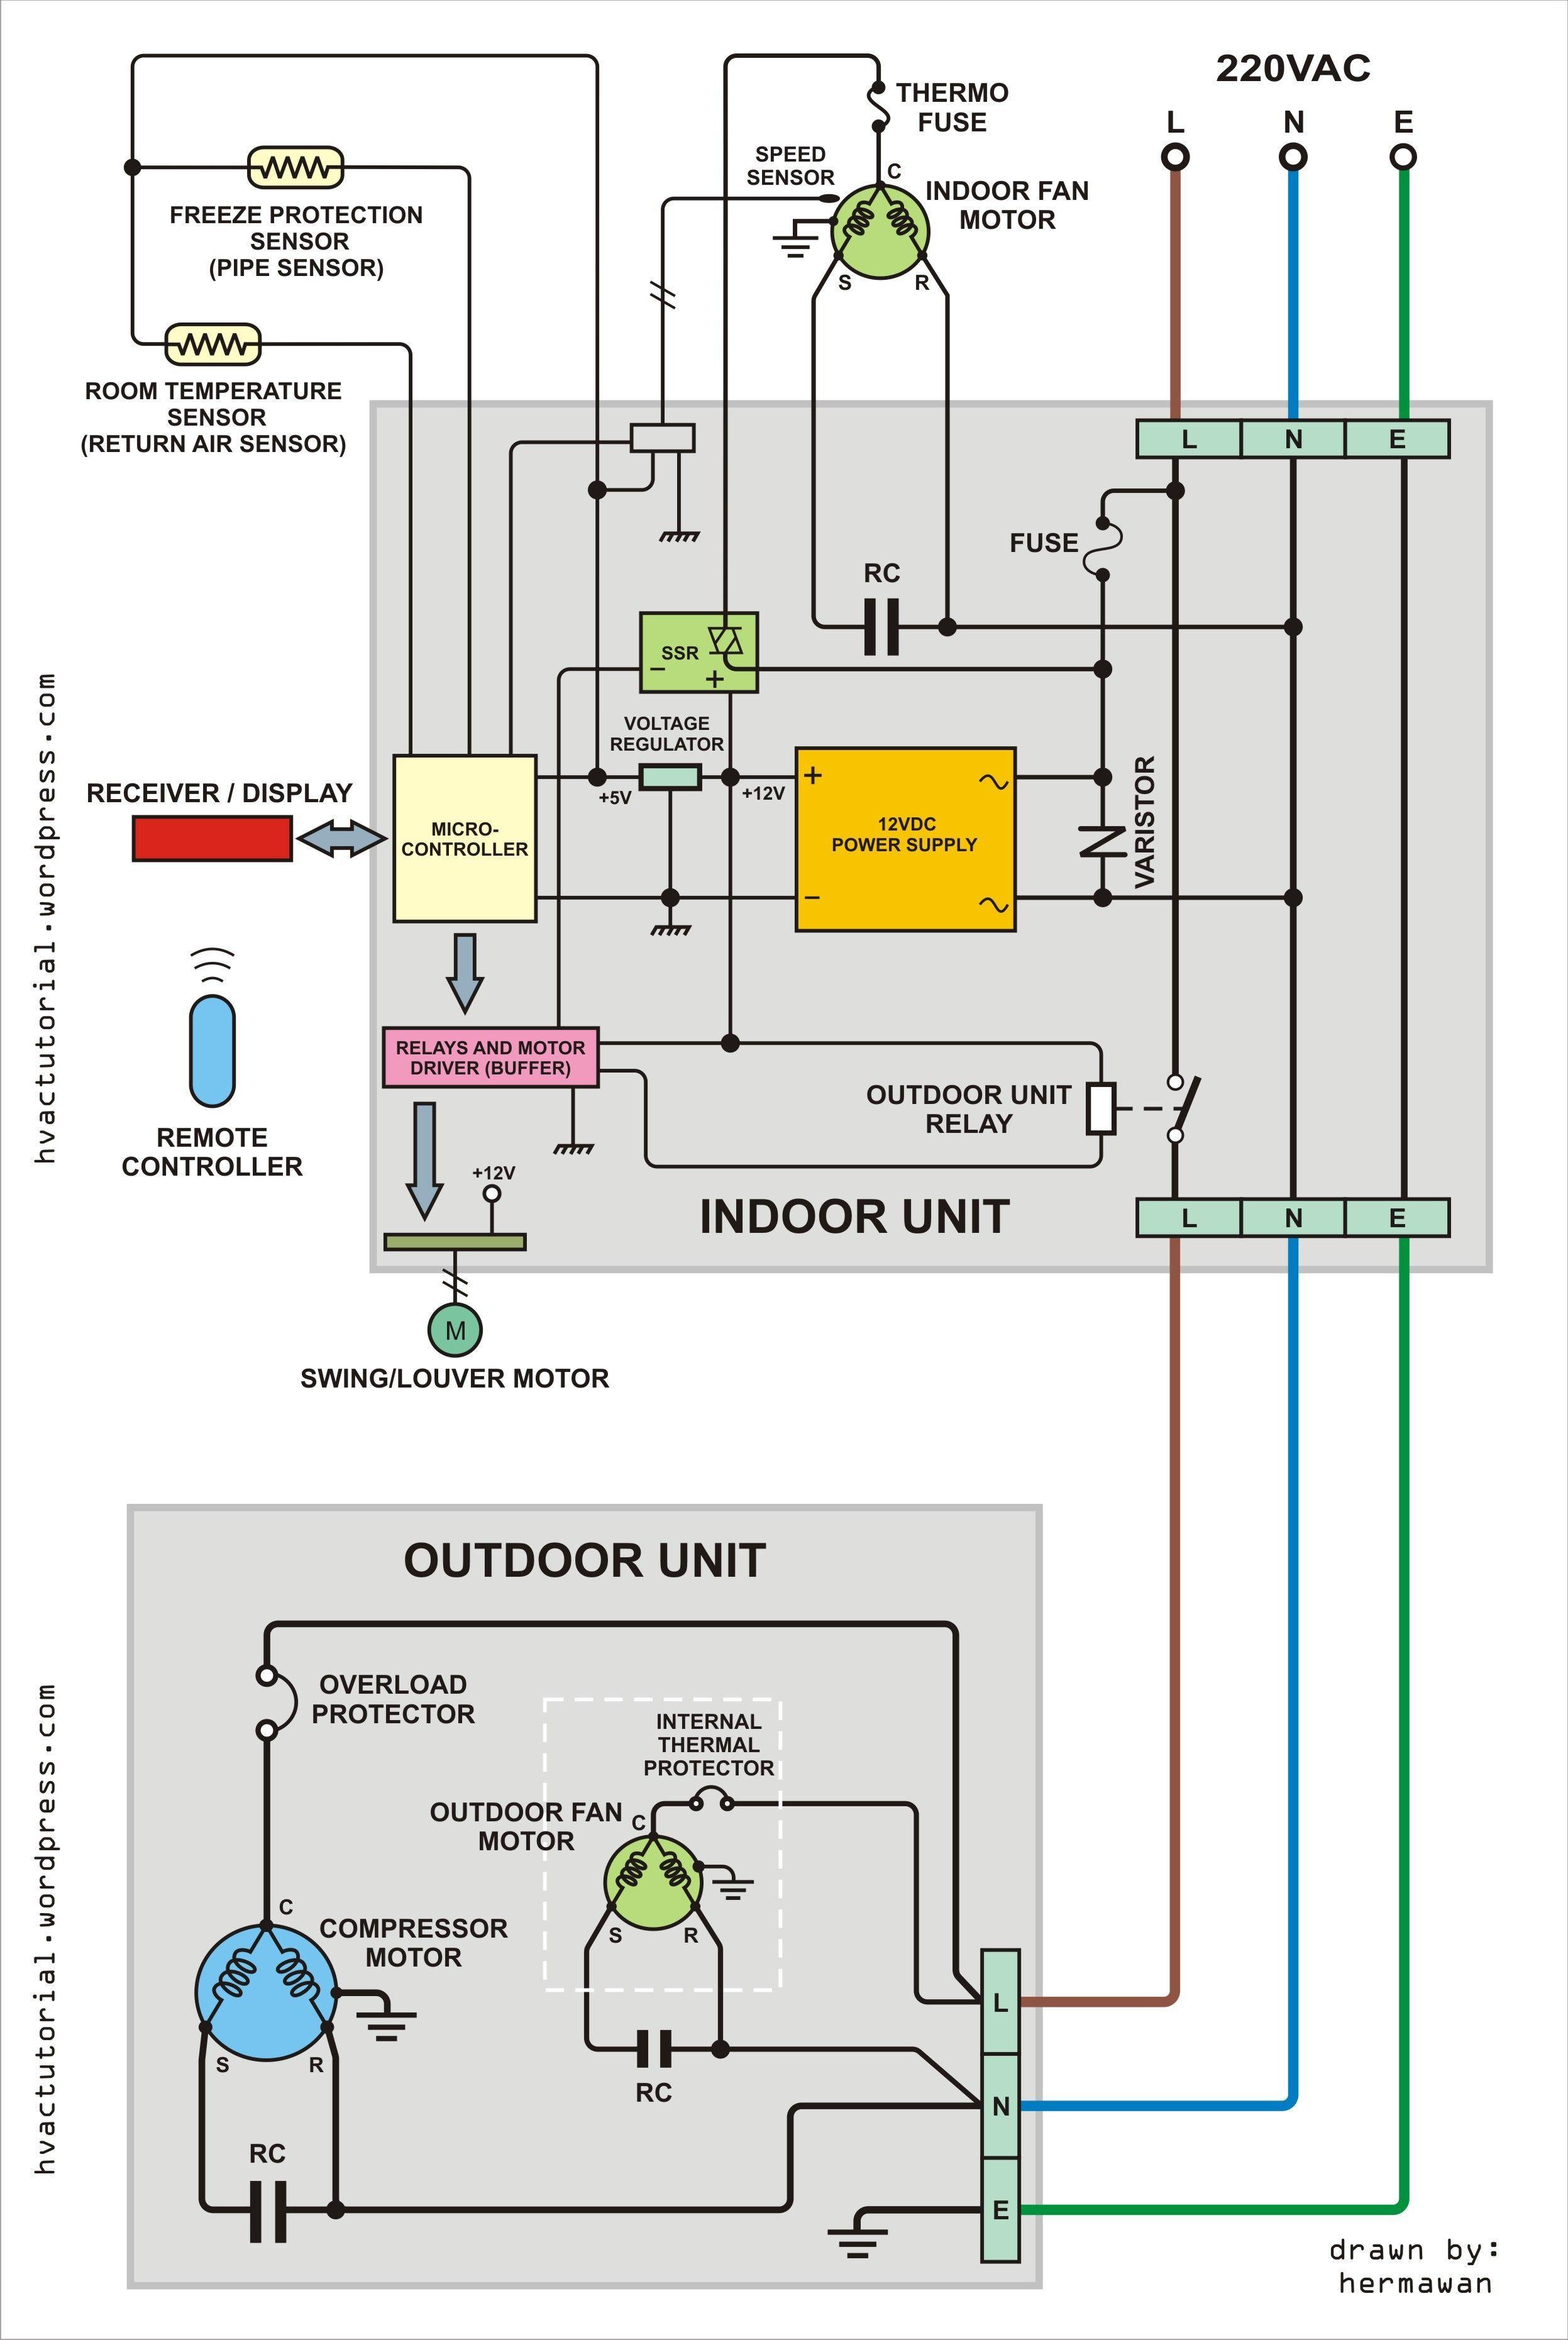 hight resolution of new hvac wiring diagram test questions diagram diagramsamplenew hvac wiring diagram test questions diagram diagramsample diagramtemplate